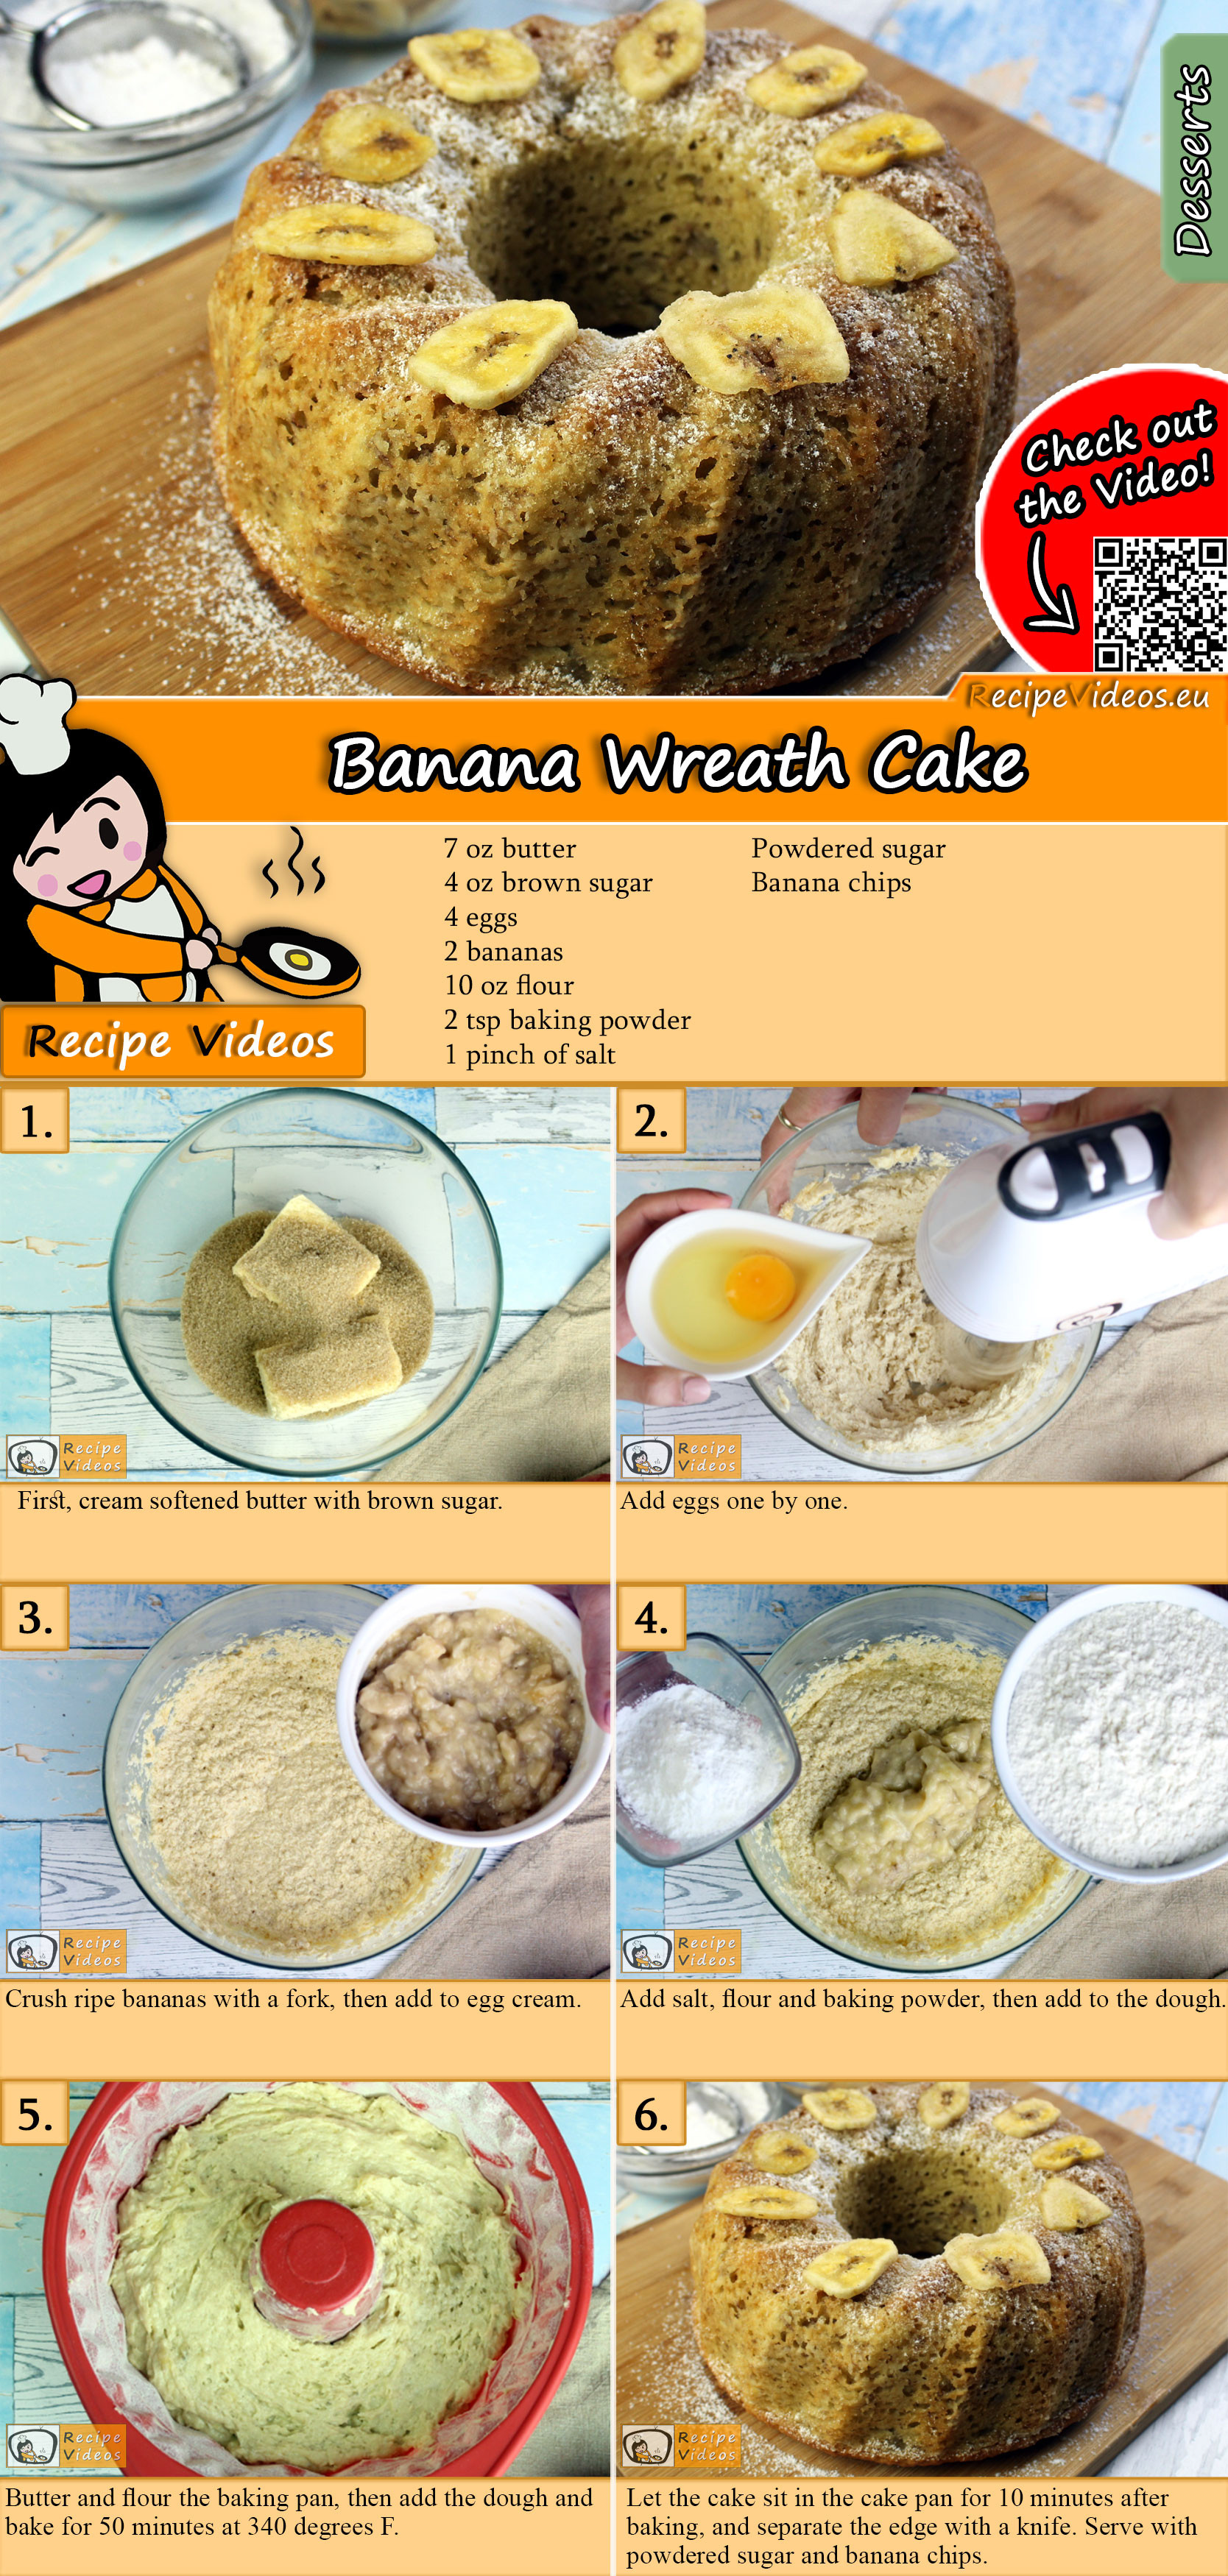 Banana wreath cake recipe with video